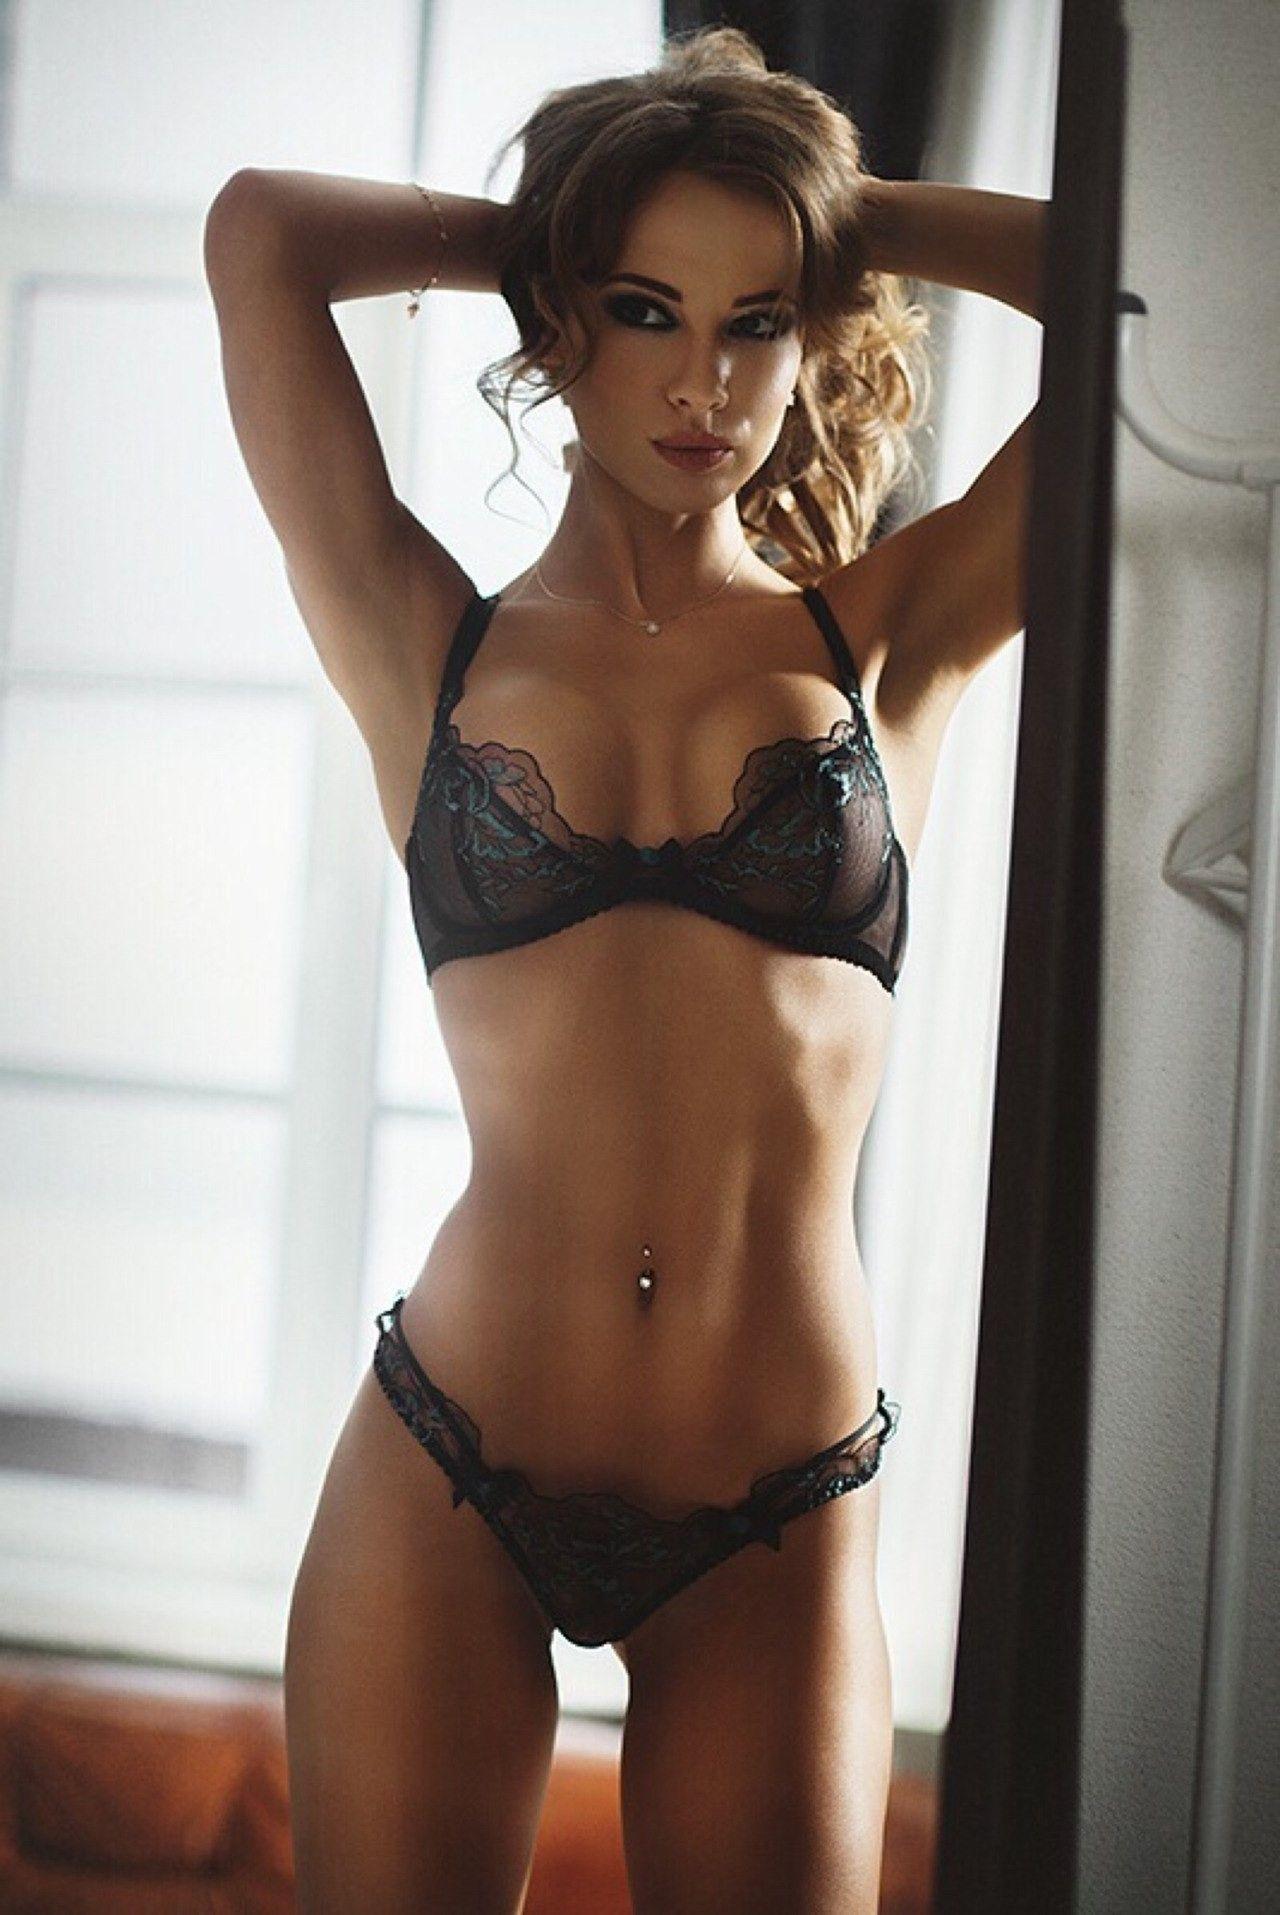 Sexy senual lingerie women